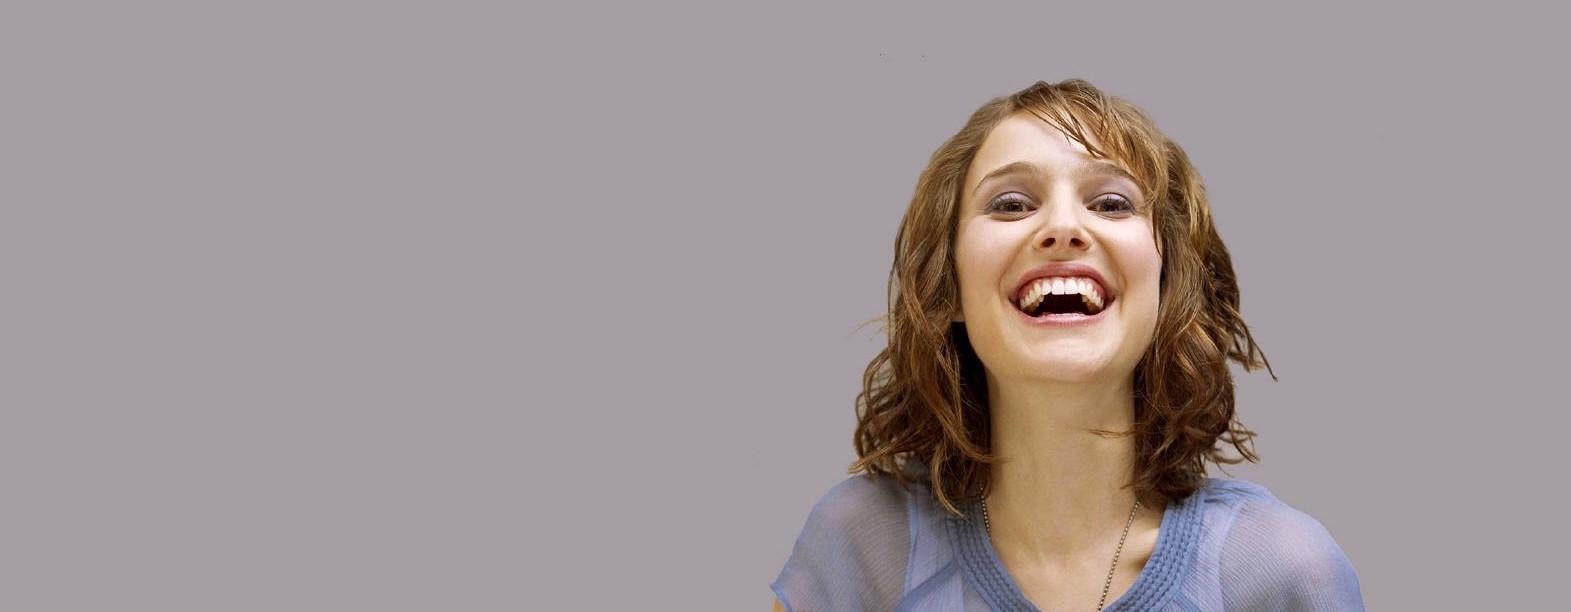 happy_people_girl_wallpaper_hd_10 copia